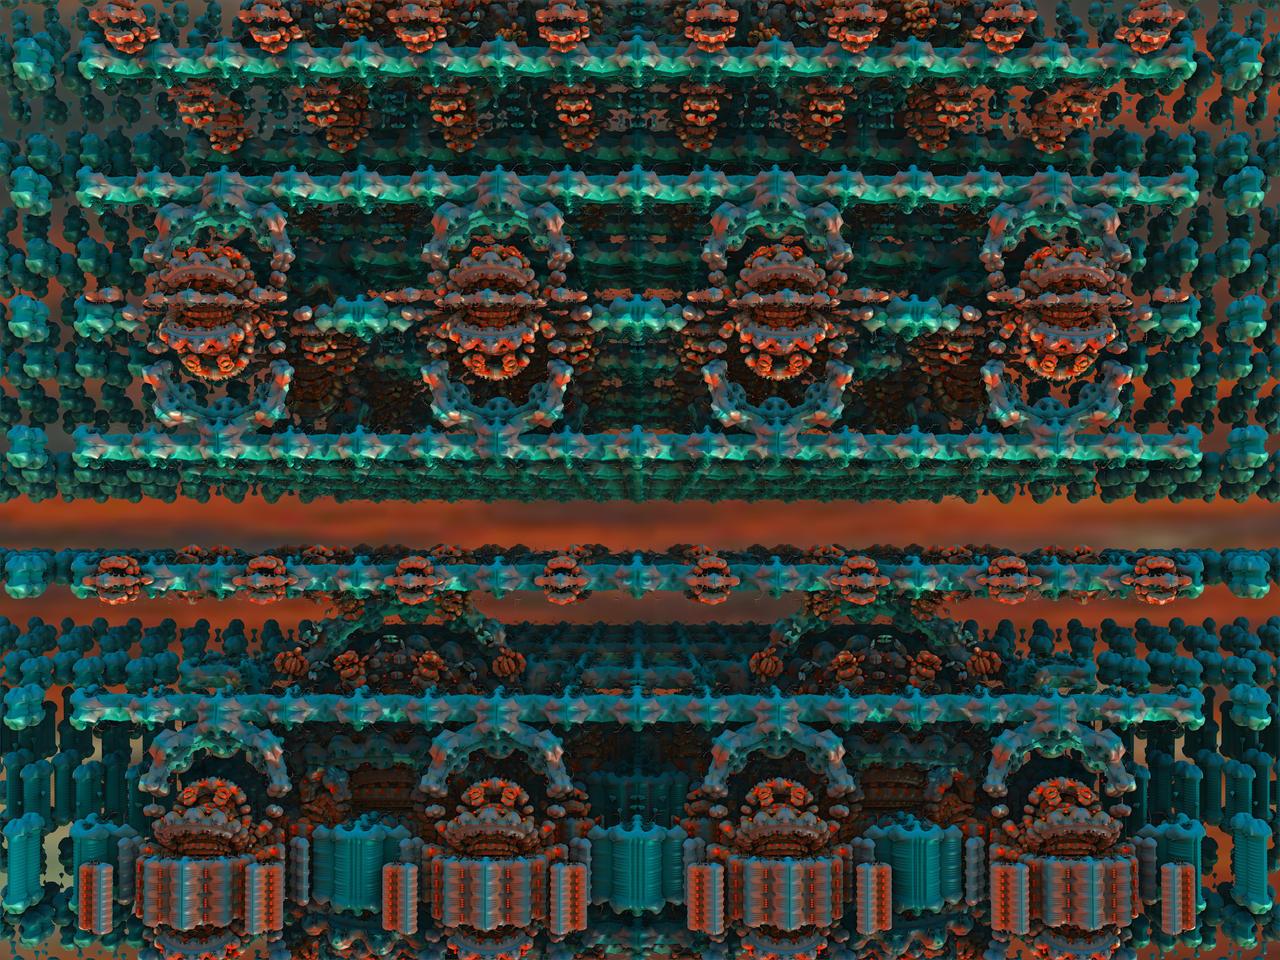 Alien candy factory